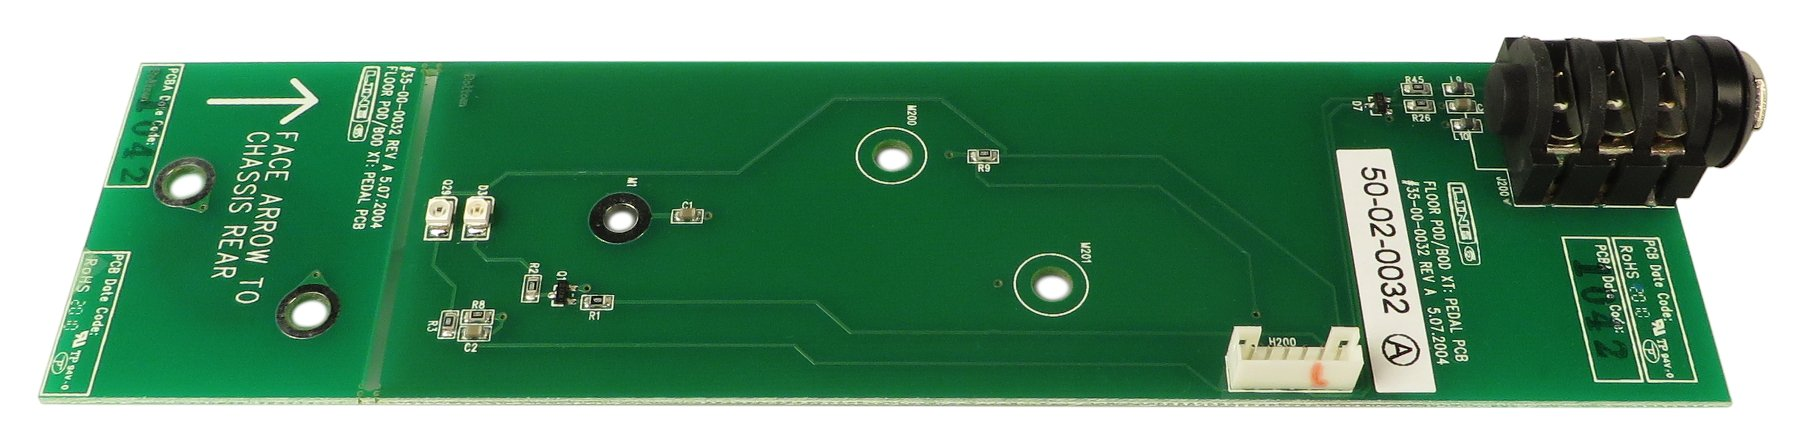 Line 6 POD Pedal PCB Assembly